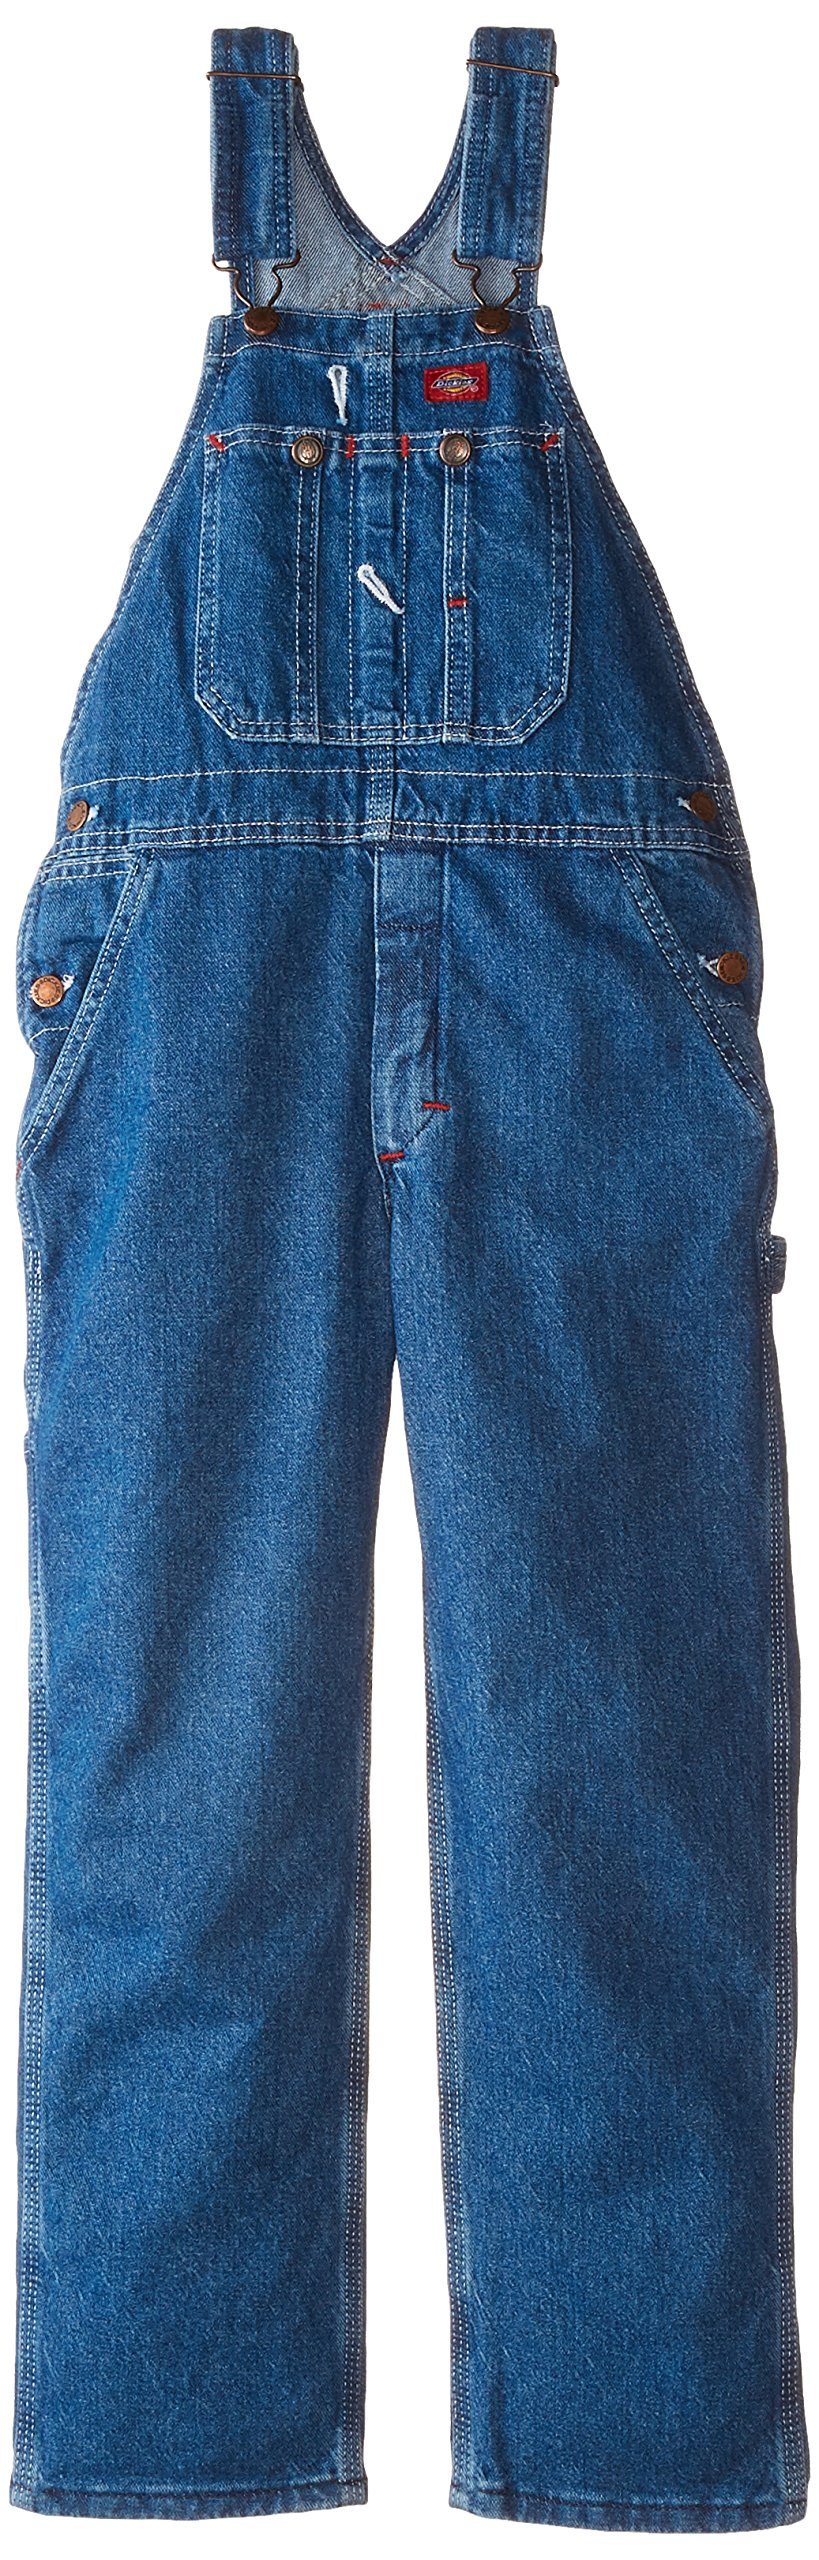 Dickies Big Boys' Denim Bib Overall, Stone Washed Indigo Blue, Large (14/16)